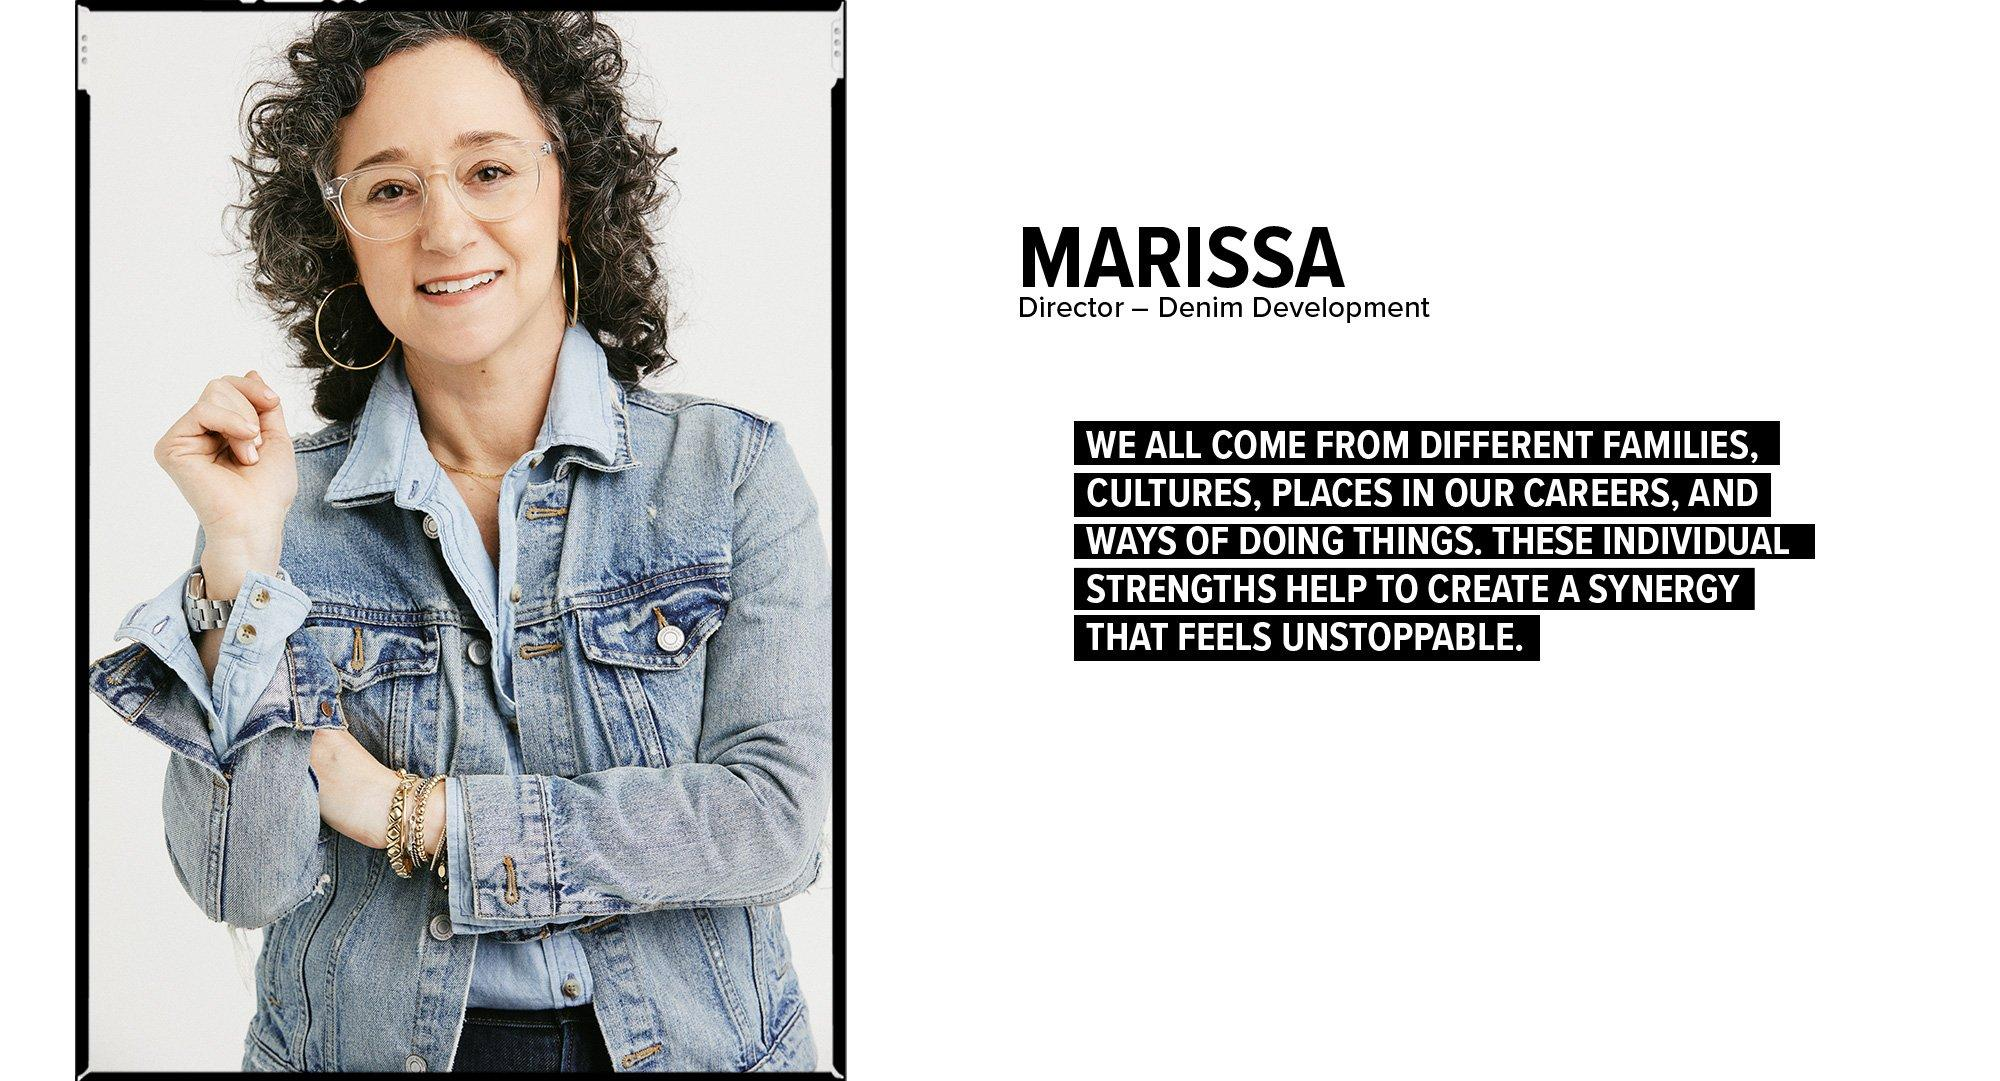 Marissa - Director Denim Development